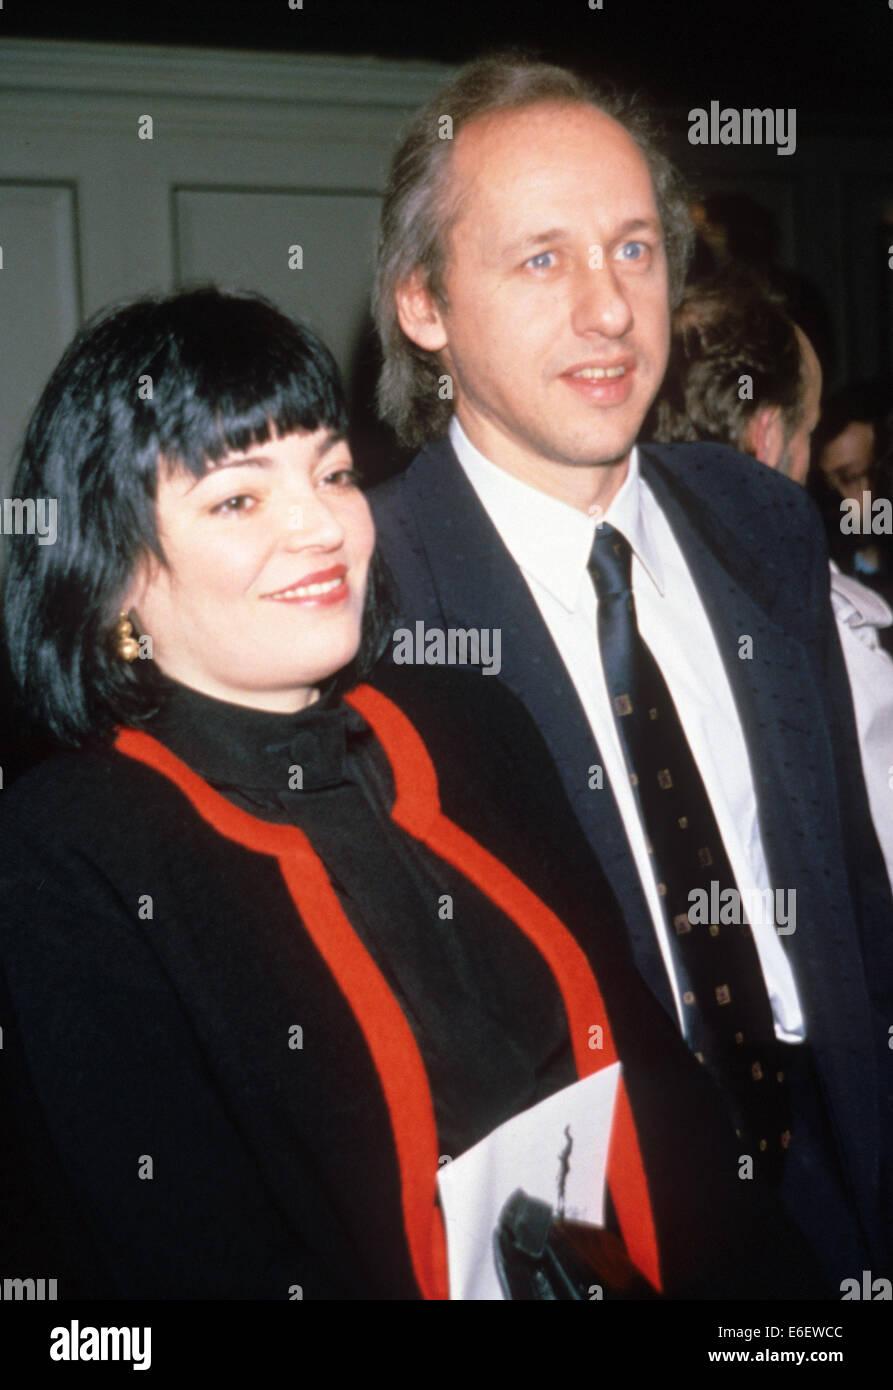 Mark Knopfler Of Dire Straits With Wife Lourdes Salamone